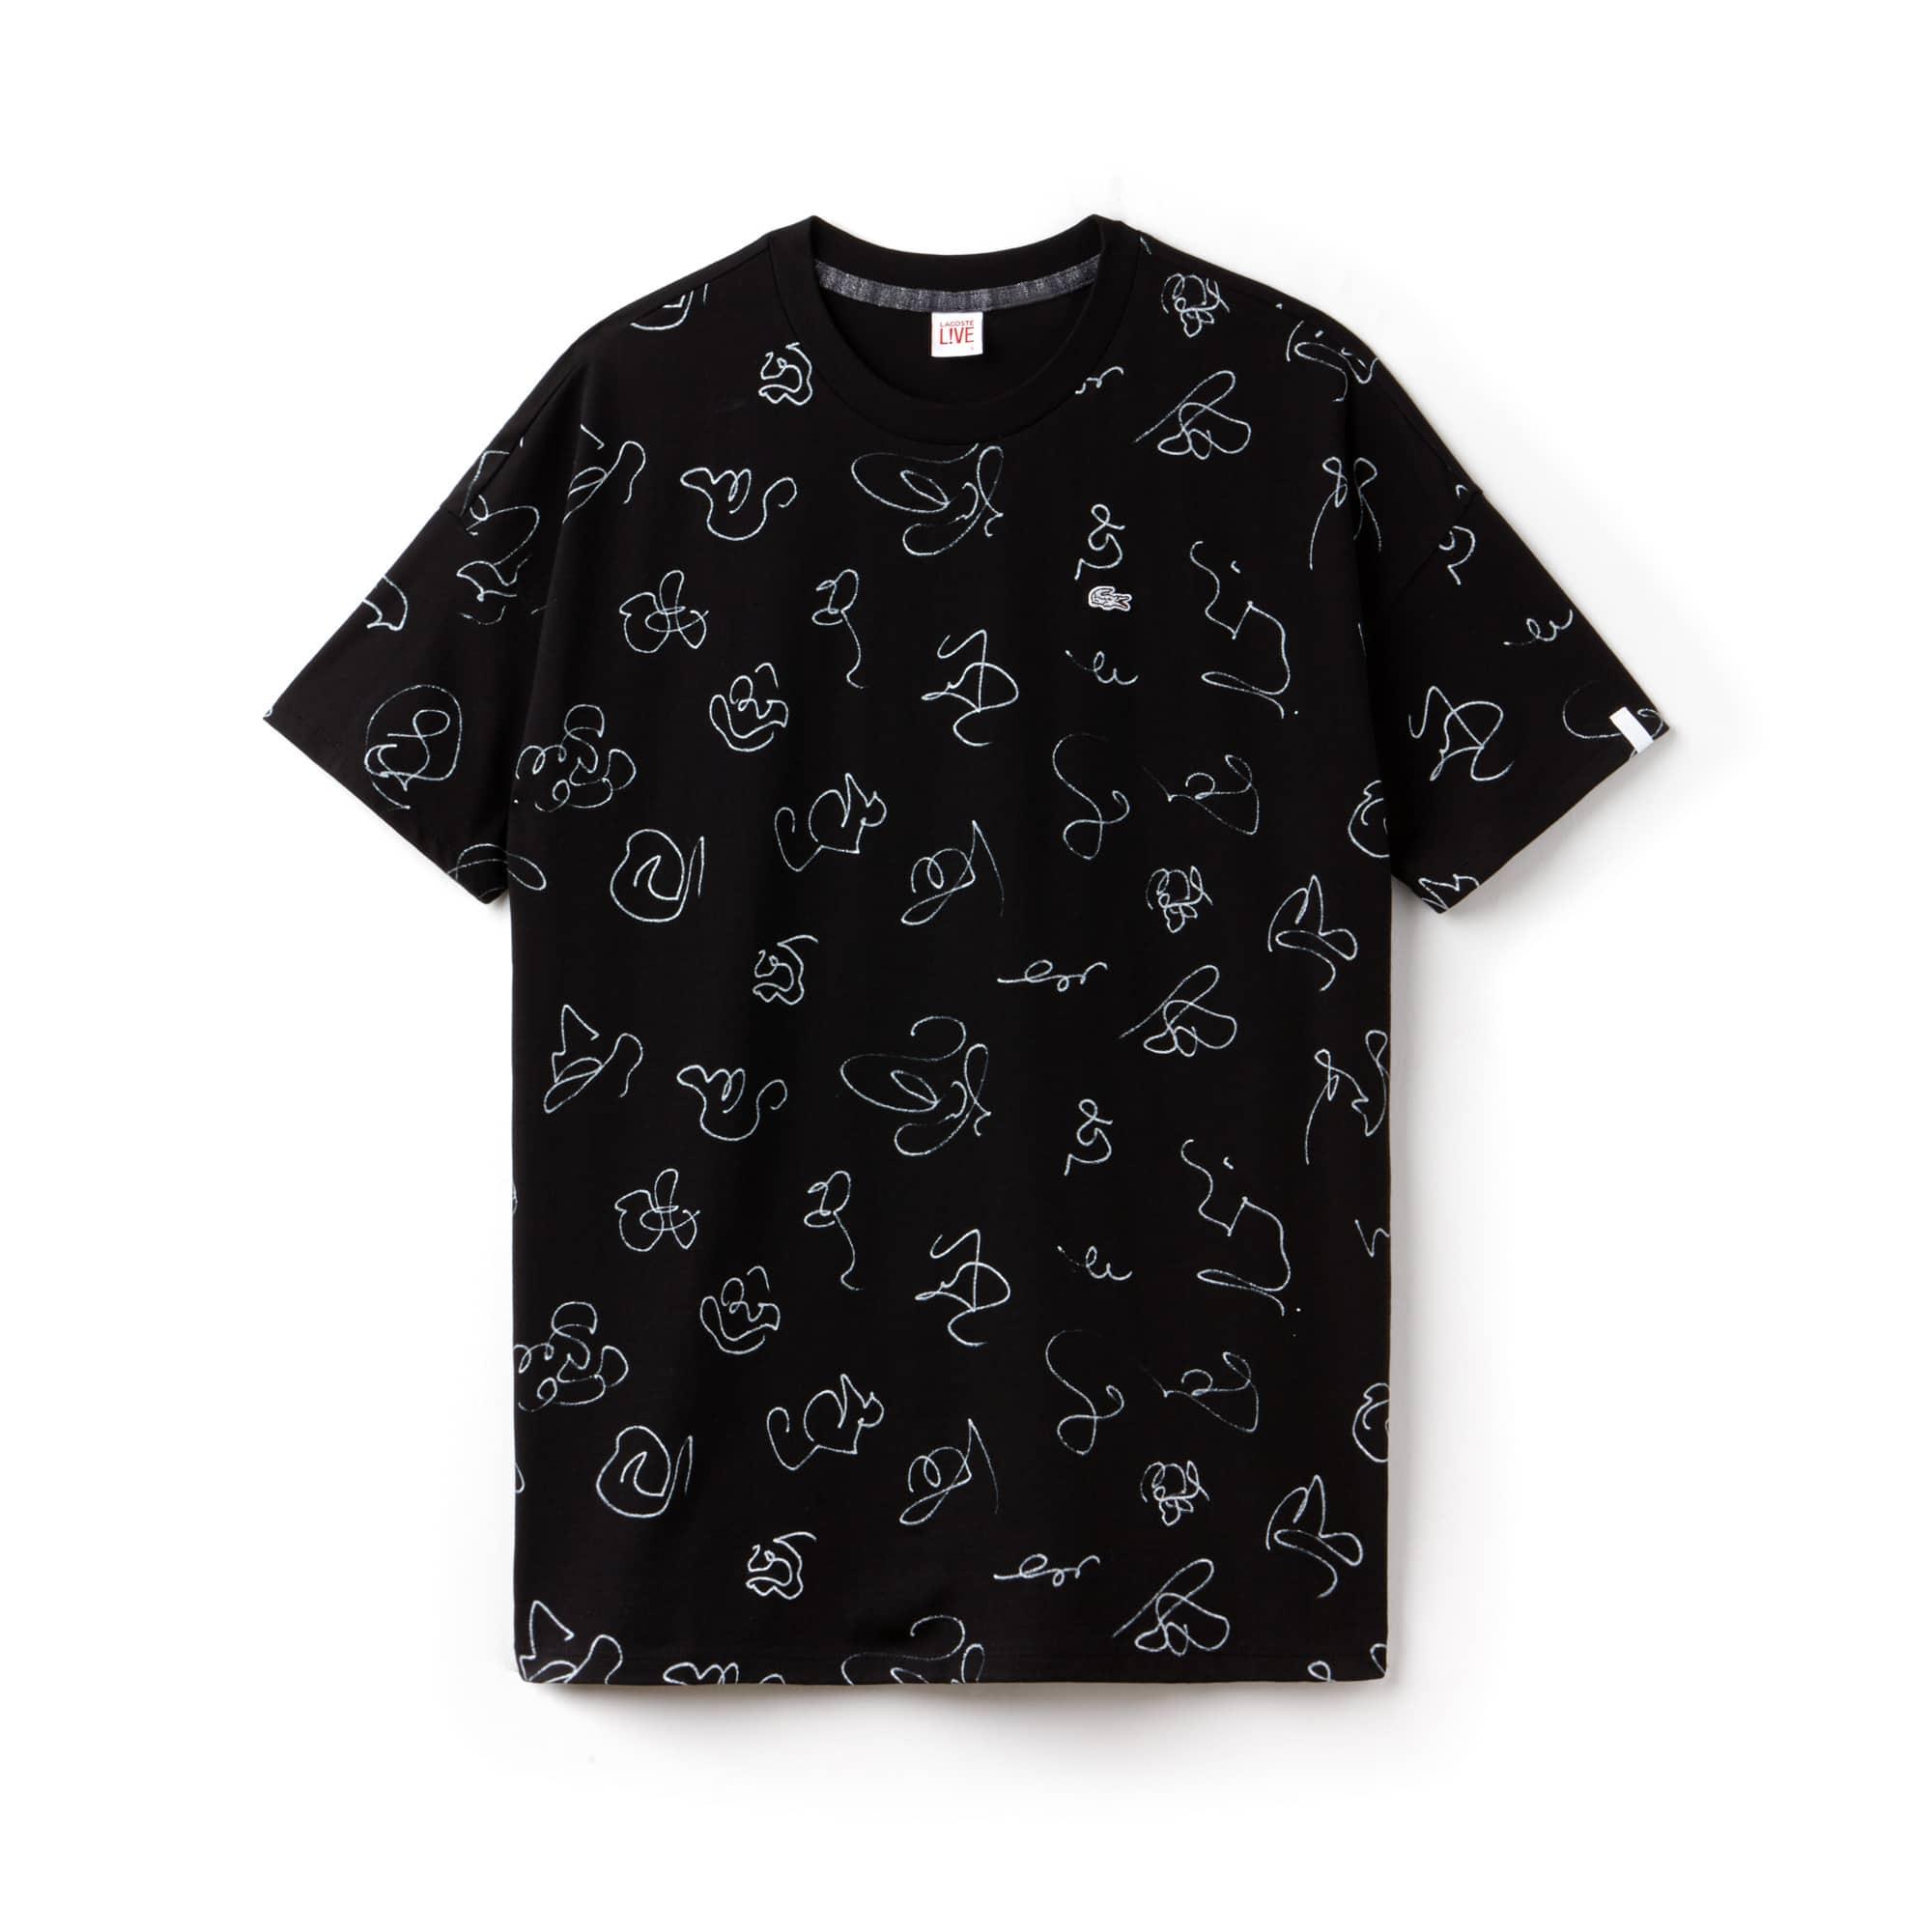 Lacoste LIVE-T-shirt dames ronde hals graffitiprint jersey